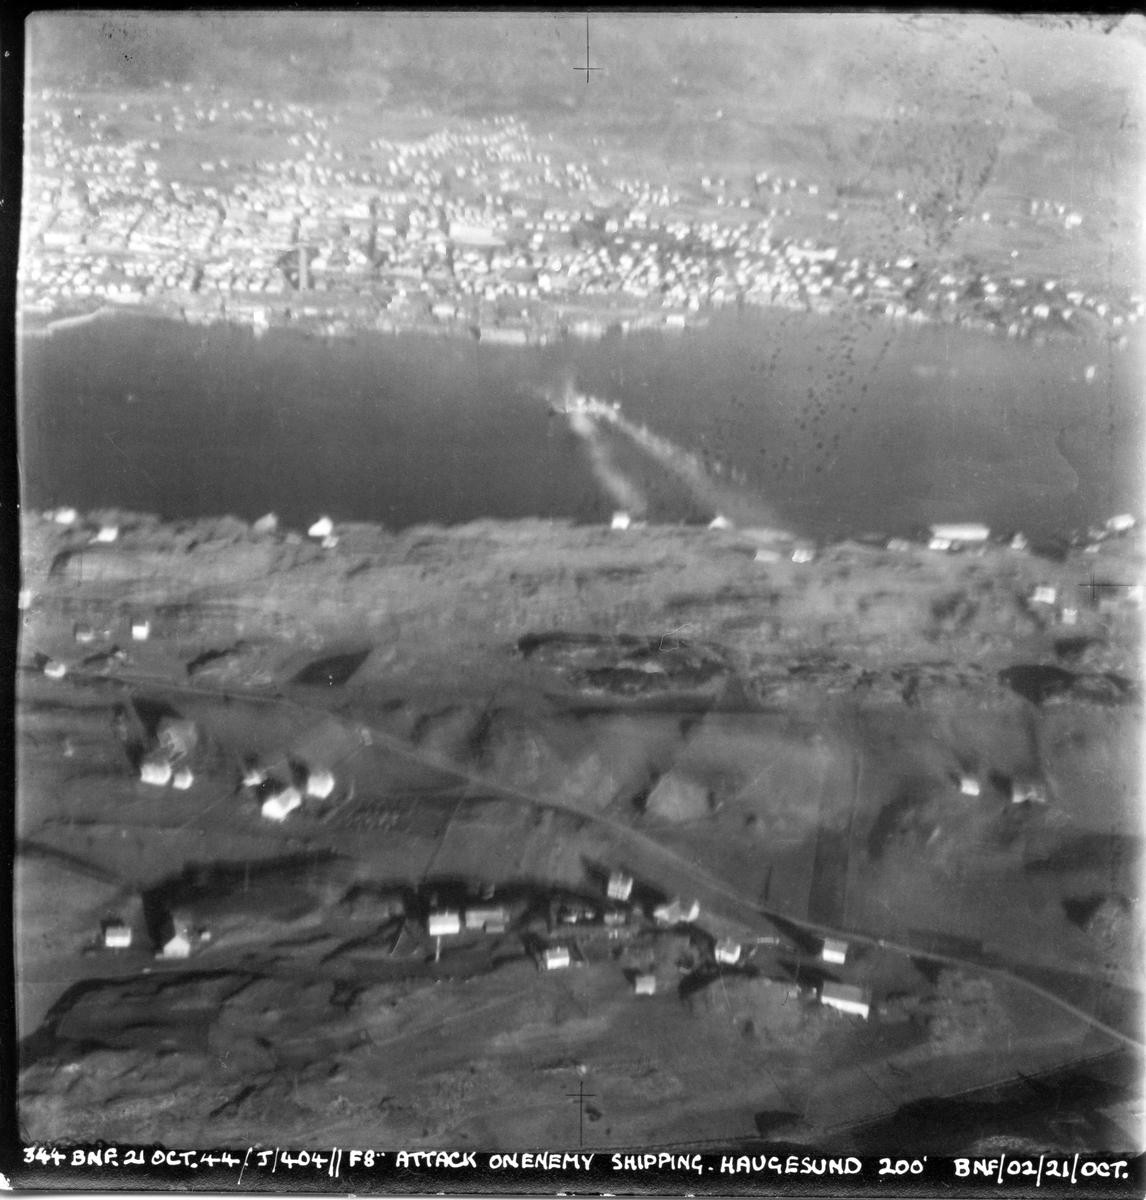 Fly angriper fiendtlige skip i Haugesund, 21. oktober 1944.